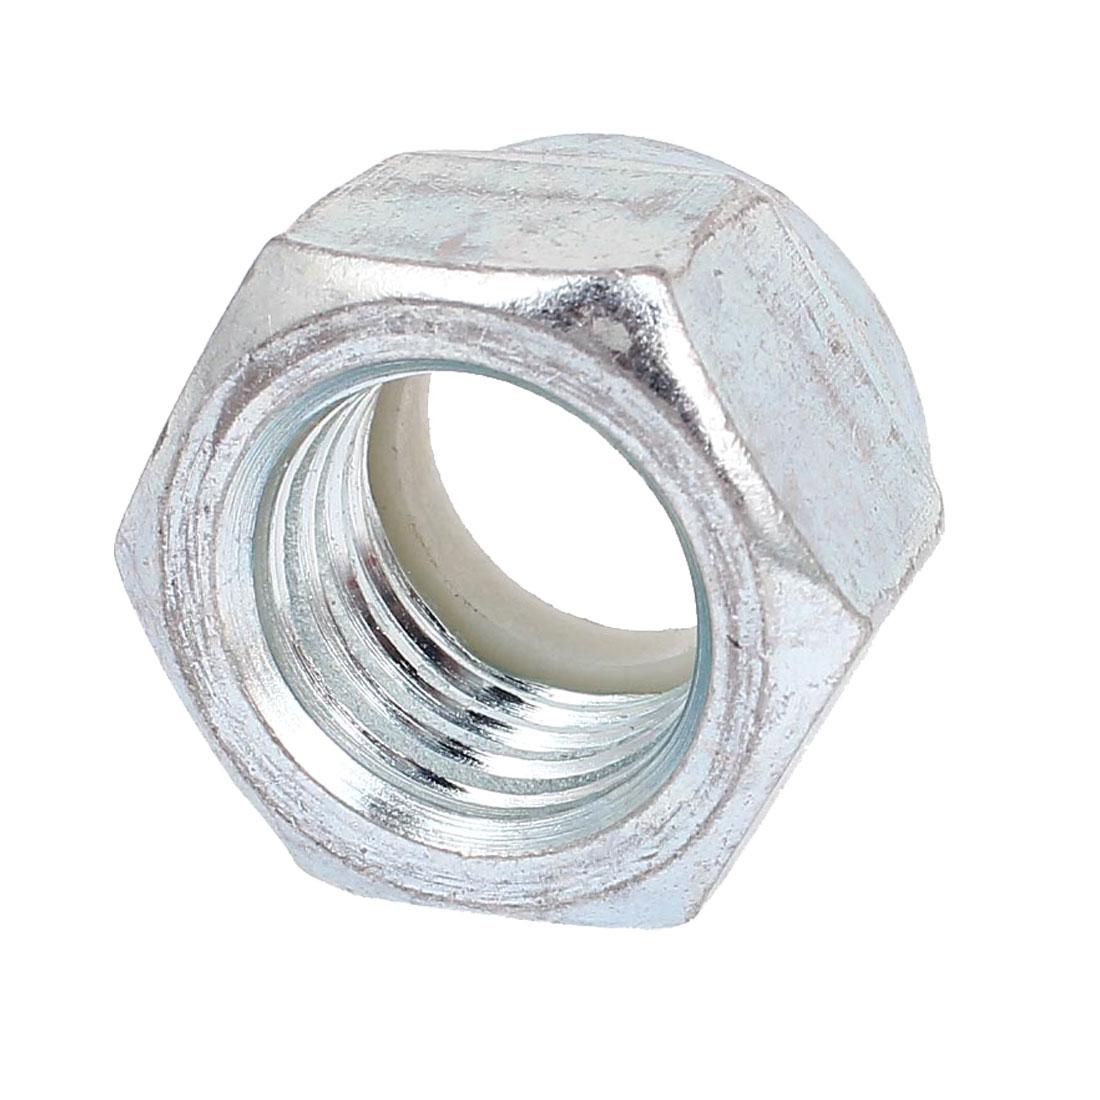 "Zinc Plated Nylock Self-Locking Nylon Insert Hex Lock Nuts 1""-8"